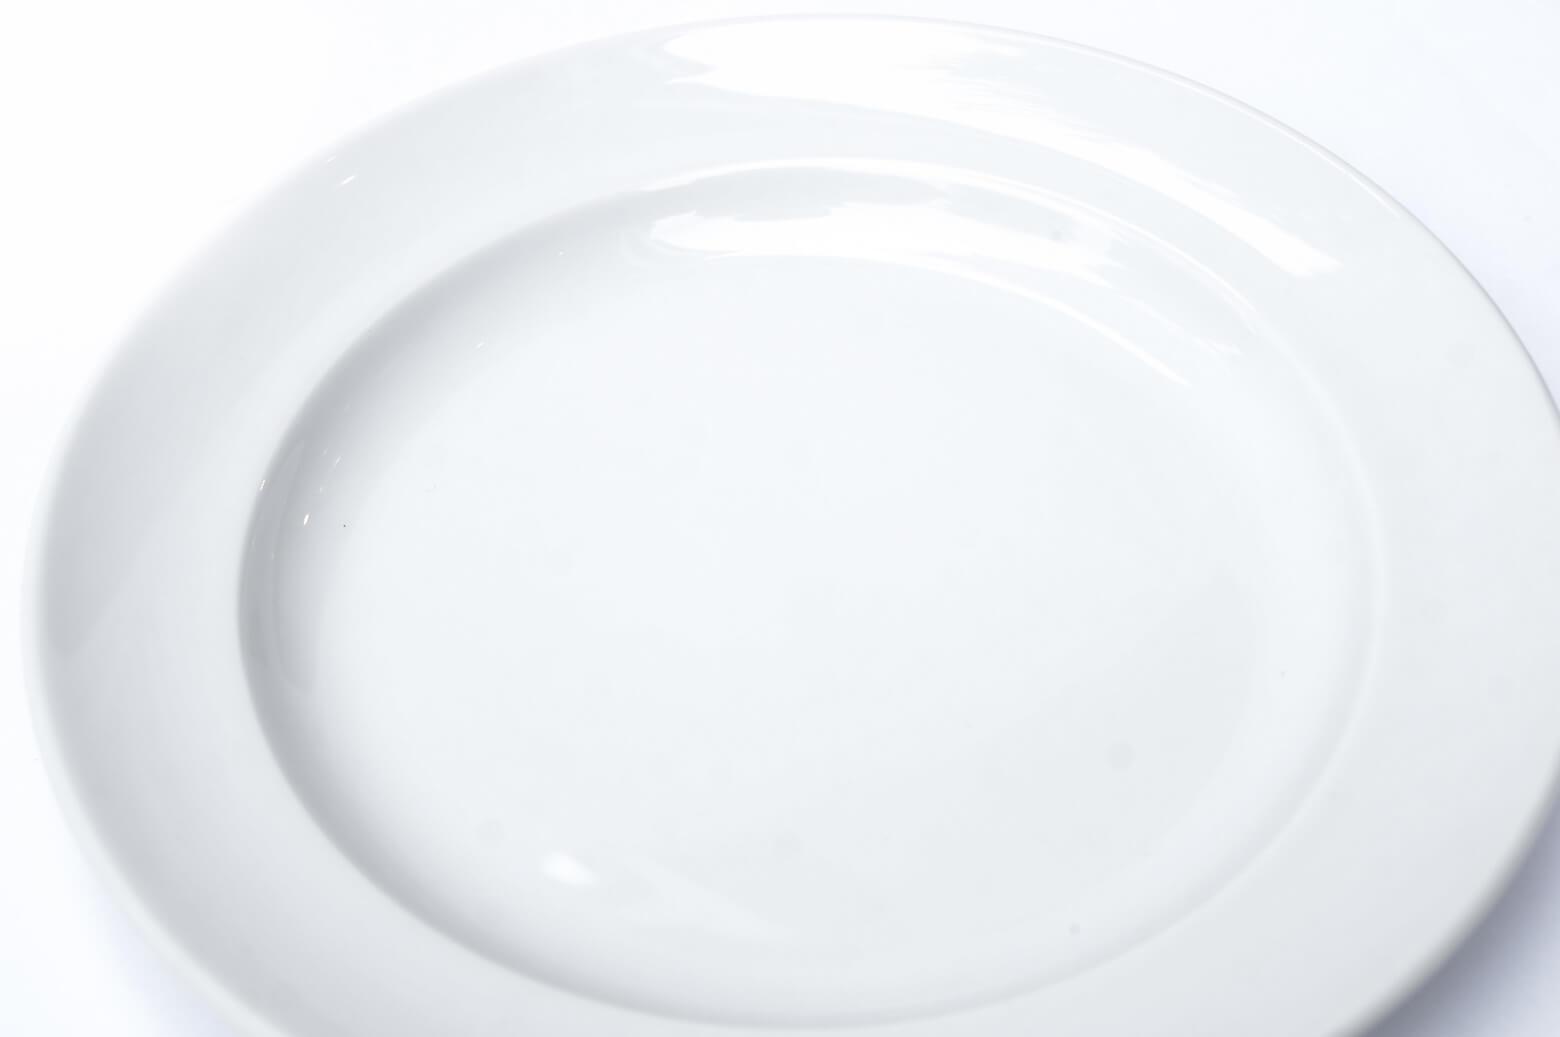 Royal Copenhagen WHITE POT Series/ロイヤル コペンハーゲン ホワイト ポット シリーズ プレート 北欧 食器